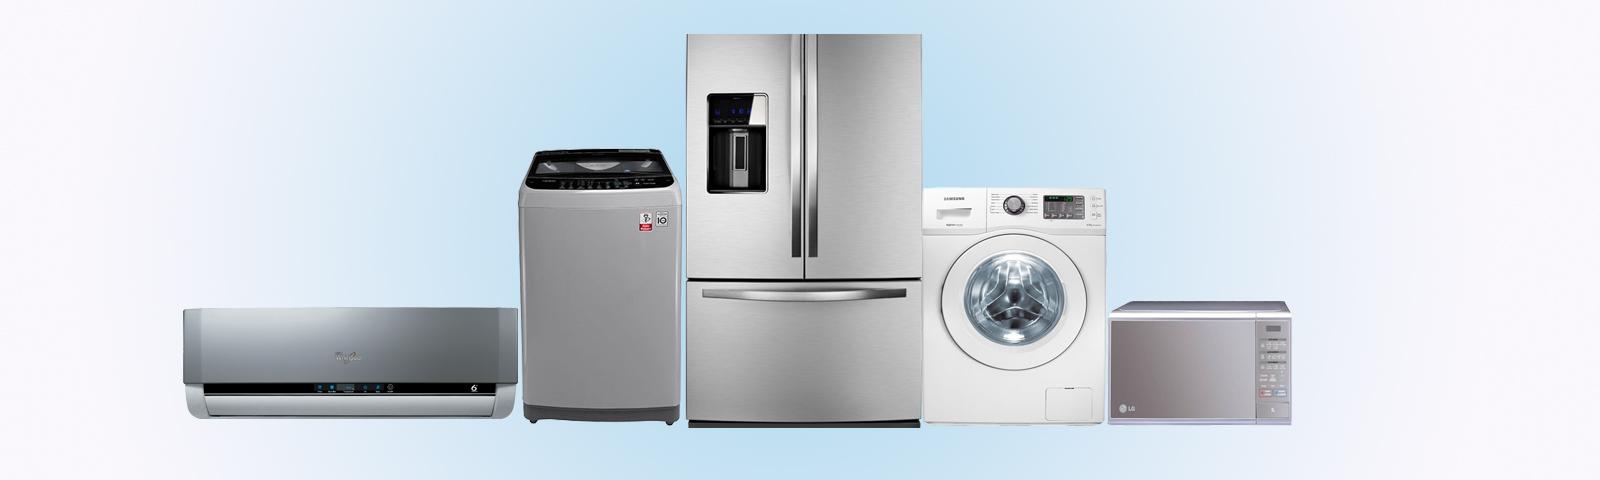 Whirlpool Chennai Whirlpool Appliances Service Center In